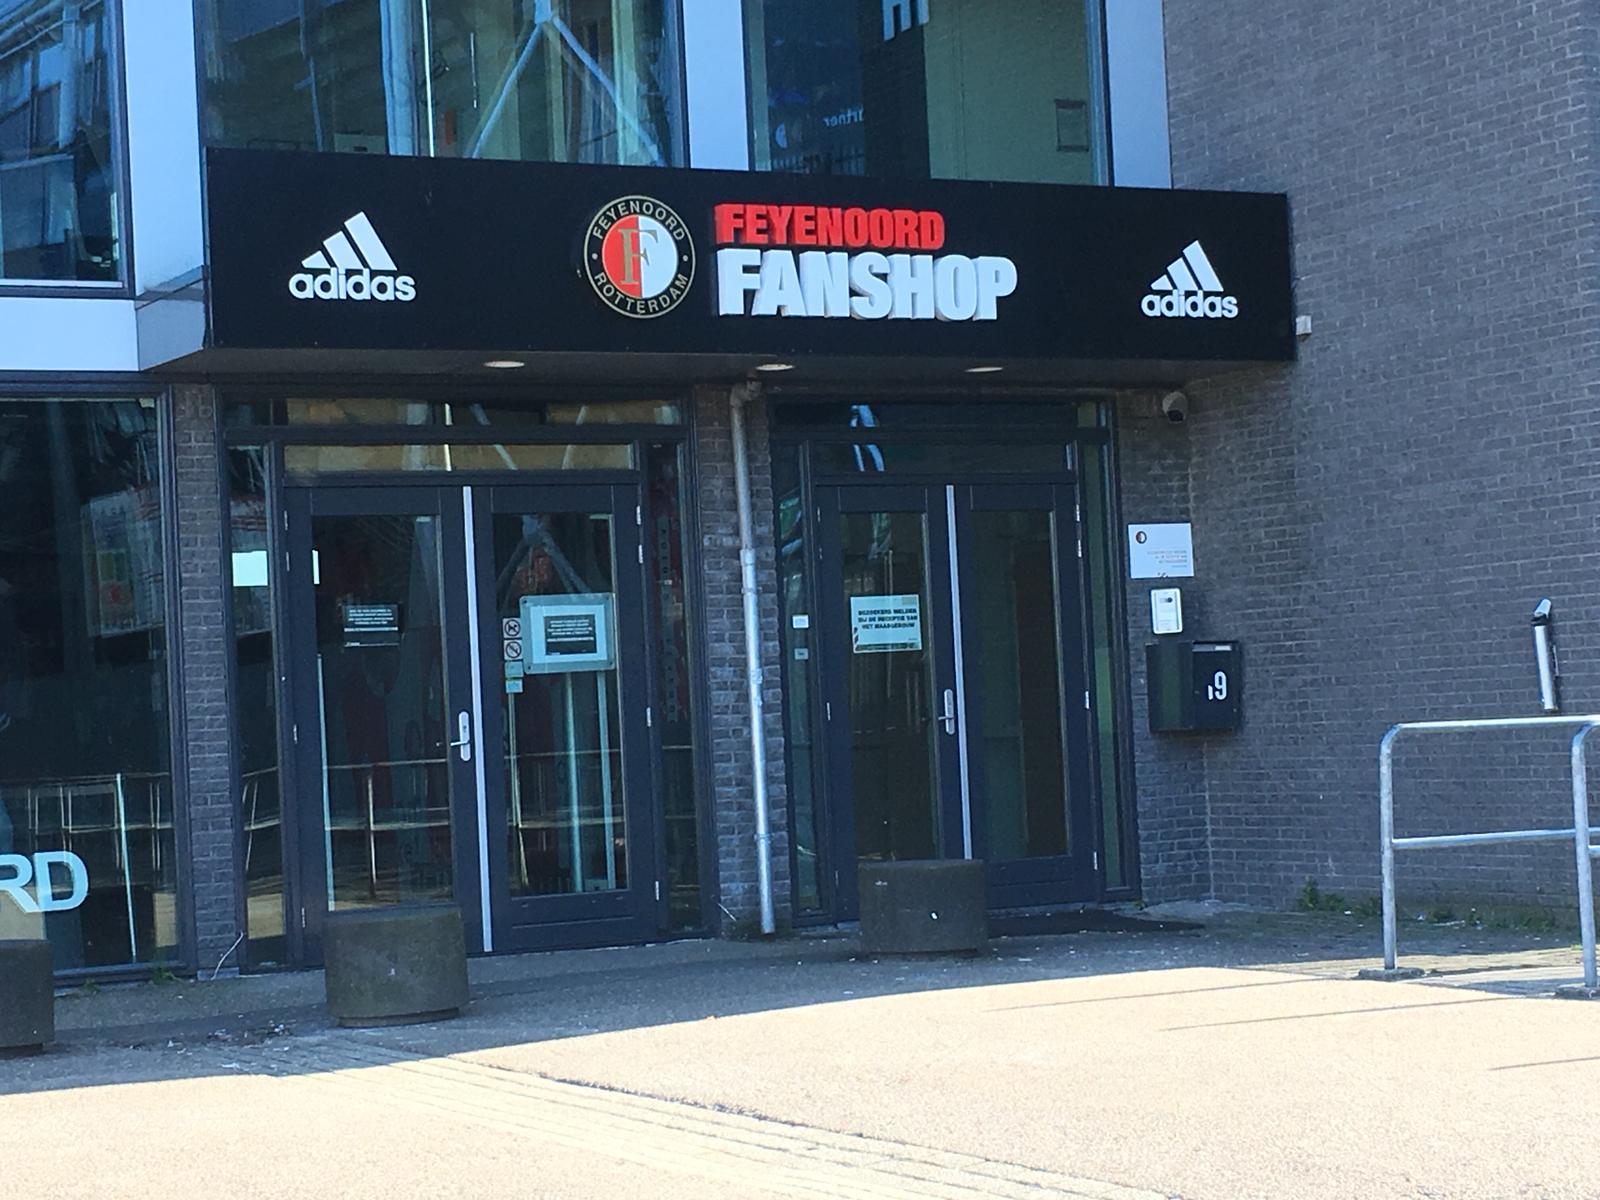 Feyenoord Fanshop 2